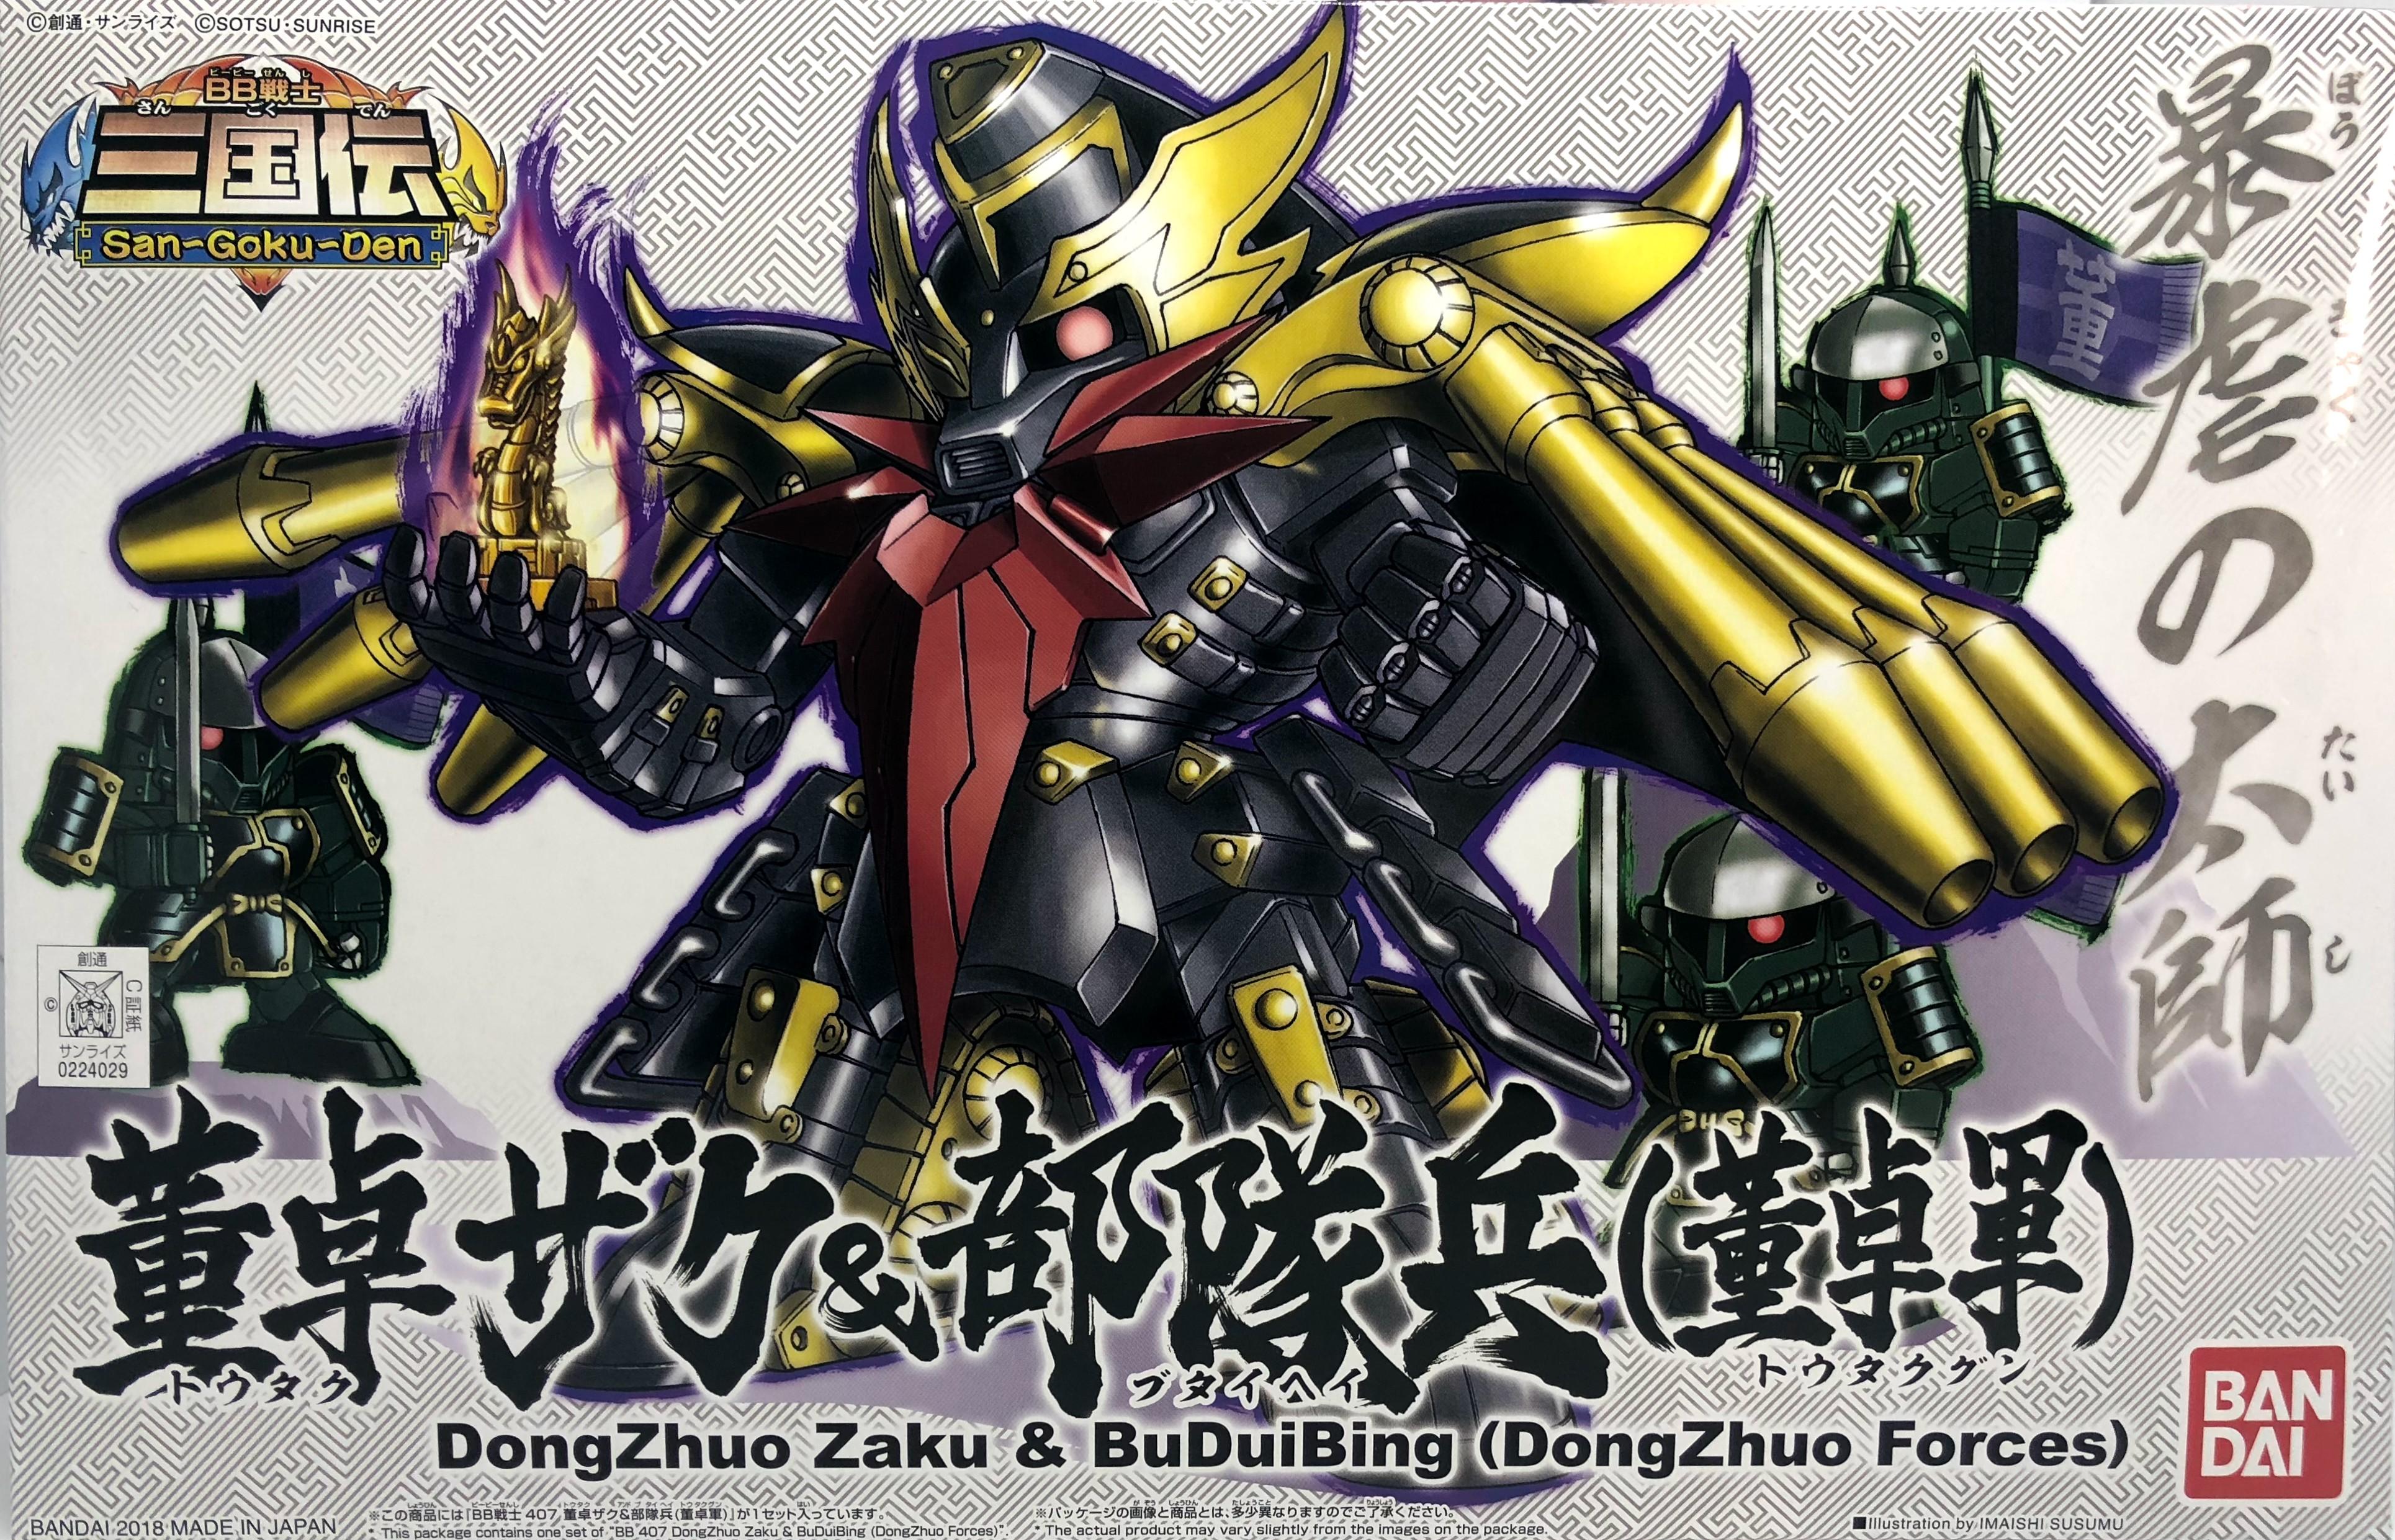 BB戦士 407 董卓 ザク 部隊兵 董卓軍 三国伝 素組み レビュー DONGZHUO ZAKU BUDUIBING REVIEW